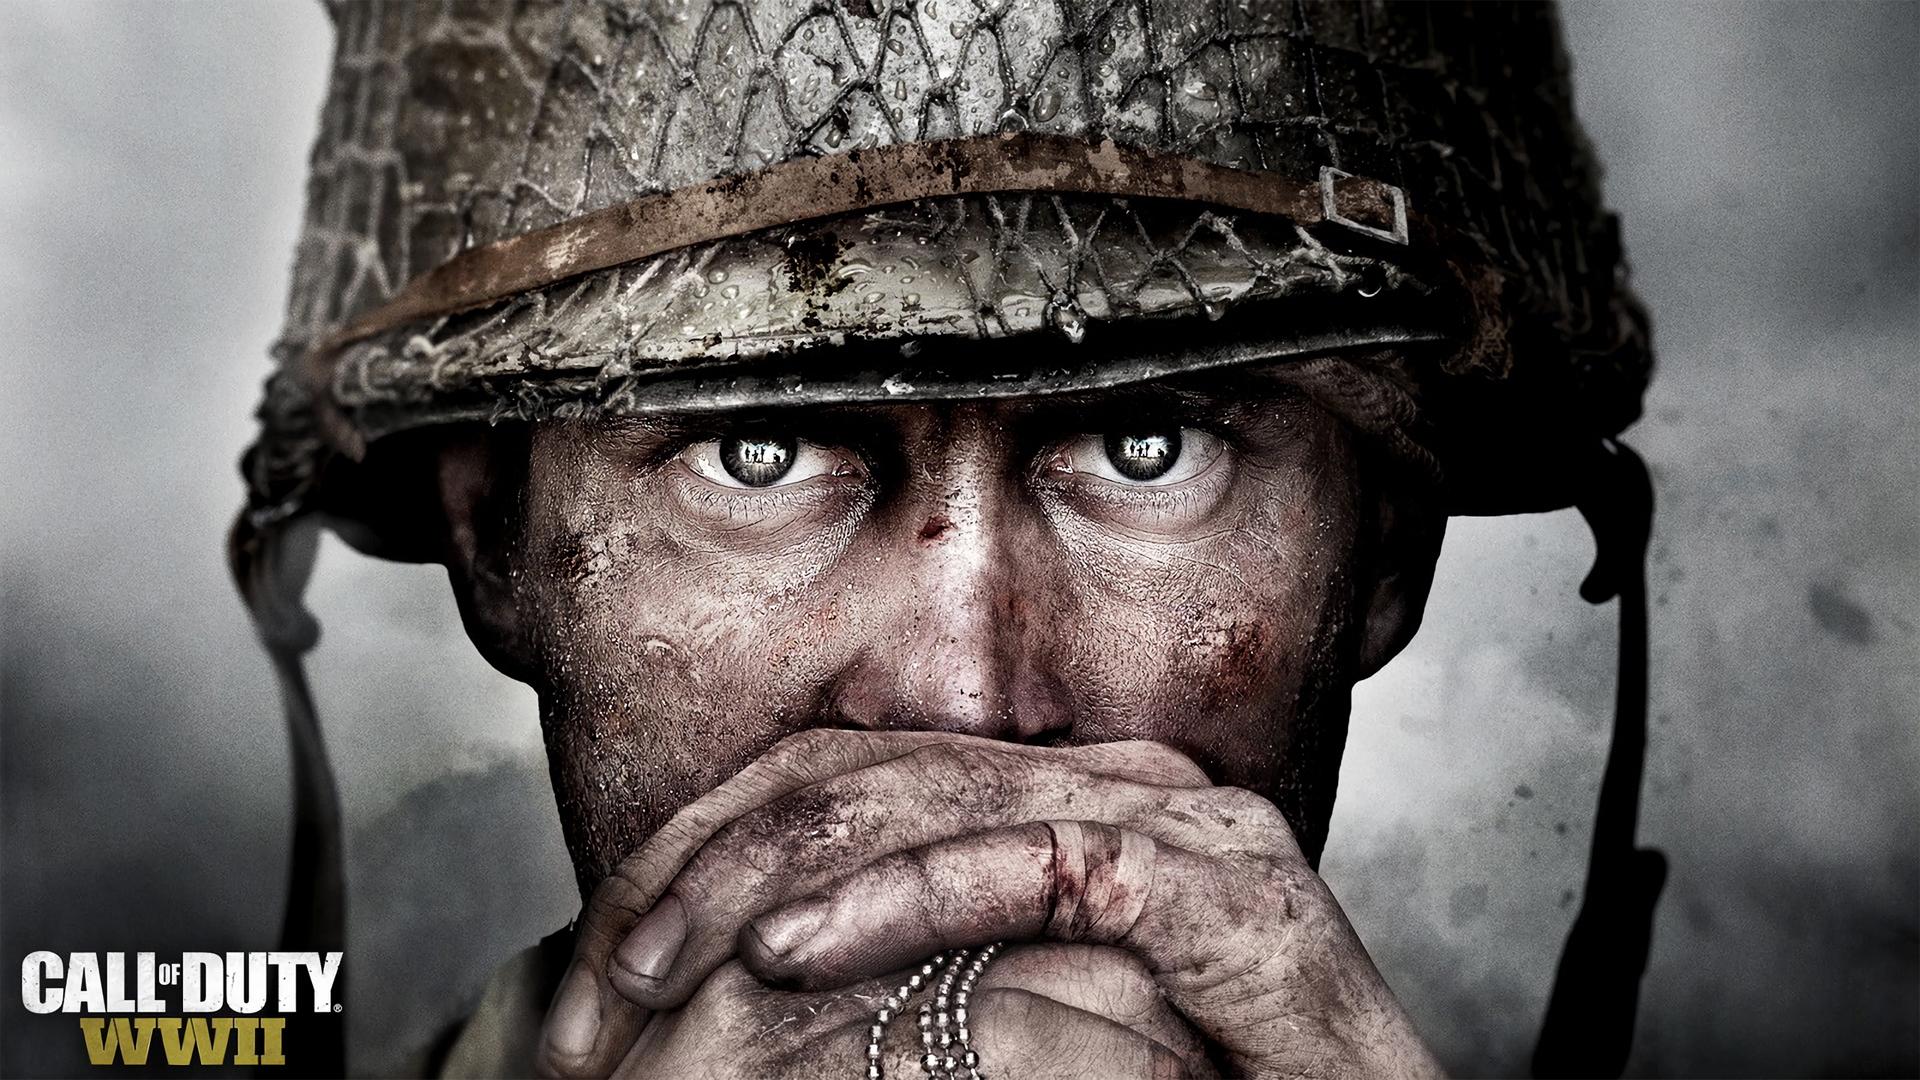 Desktop Wallpaper Call Of Duty Solider Video Game Face Hd 1920x1080